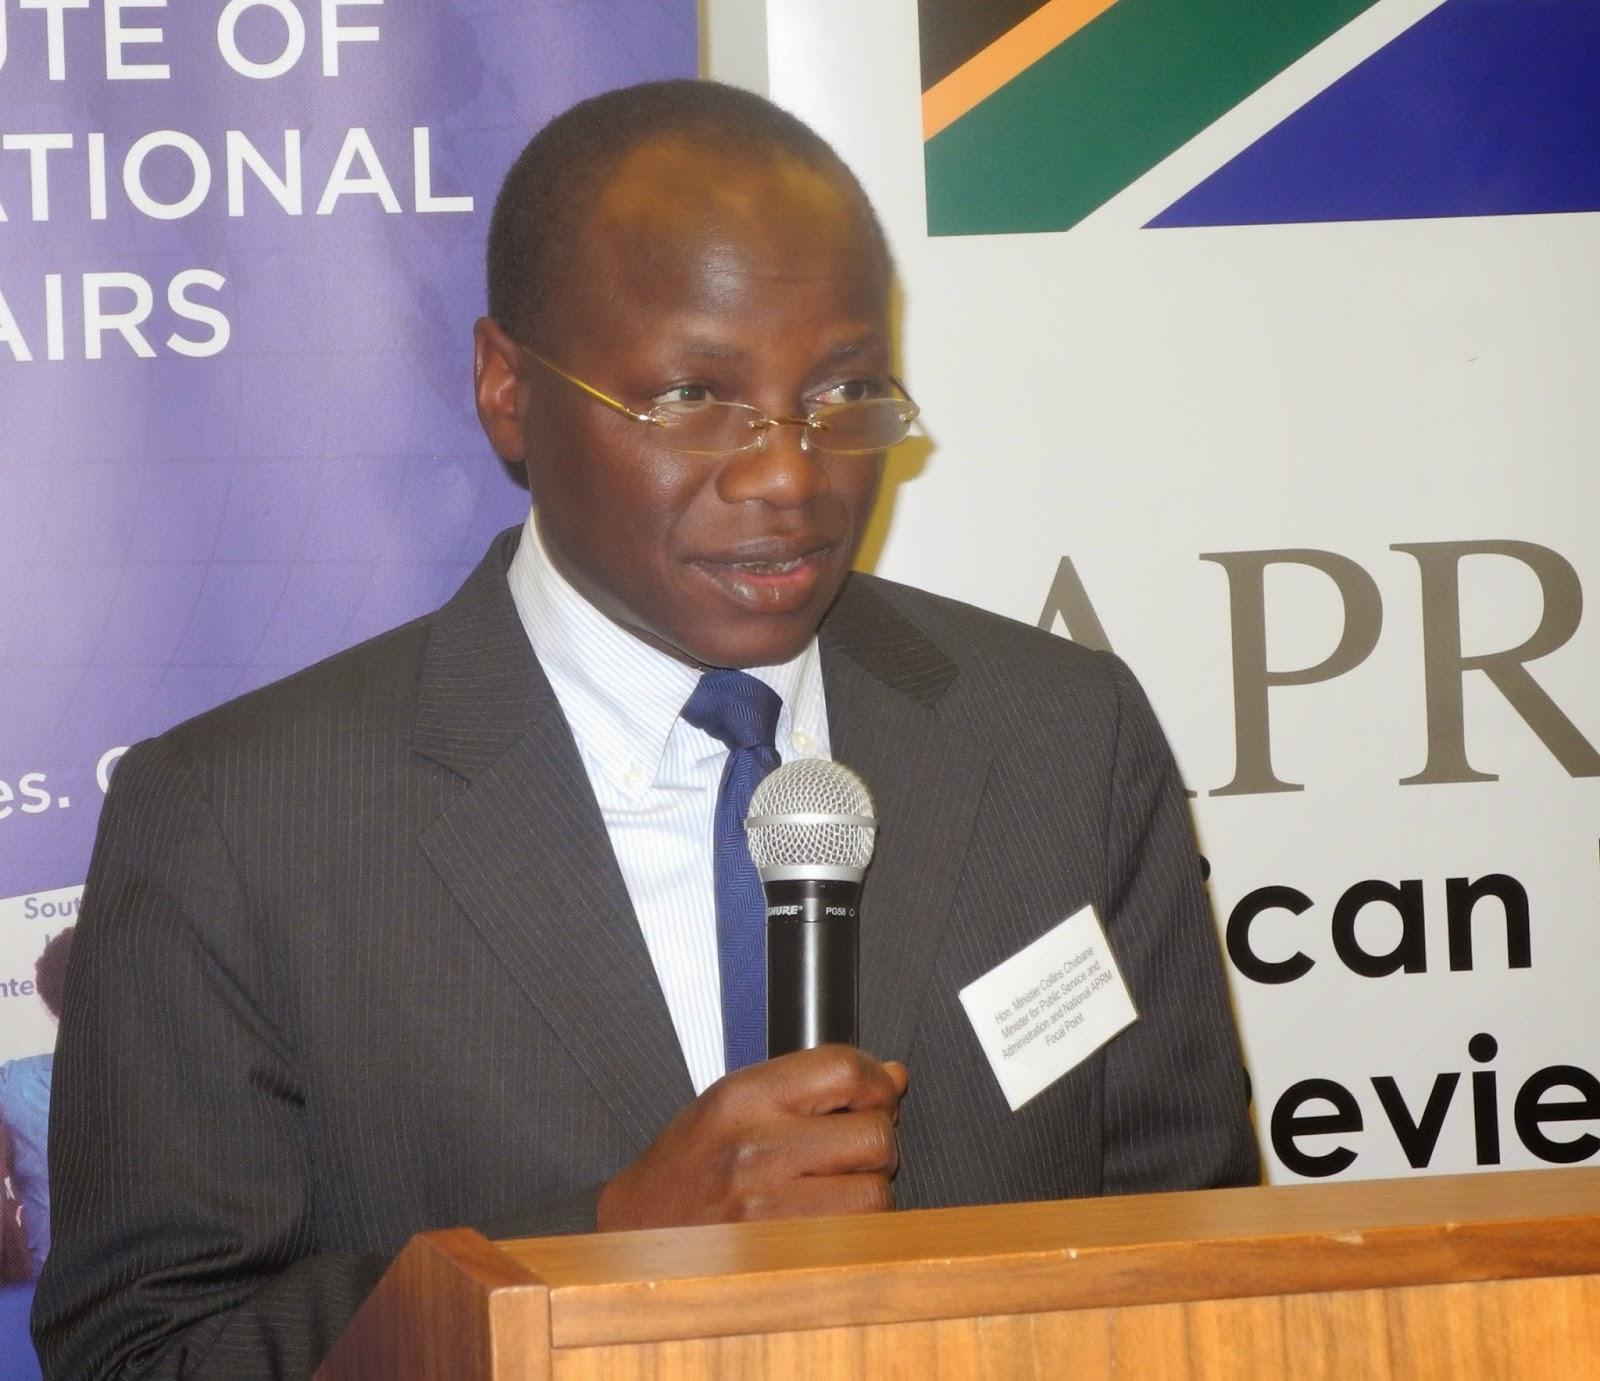 Minister Chabane